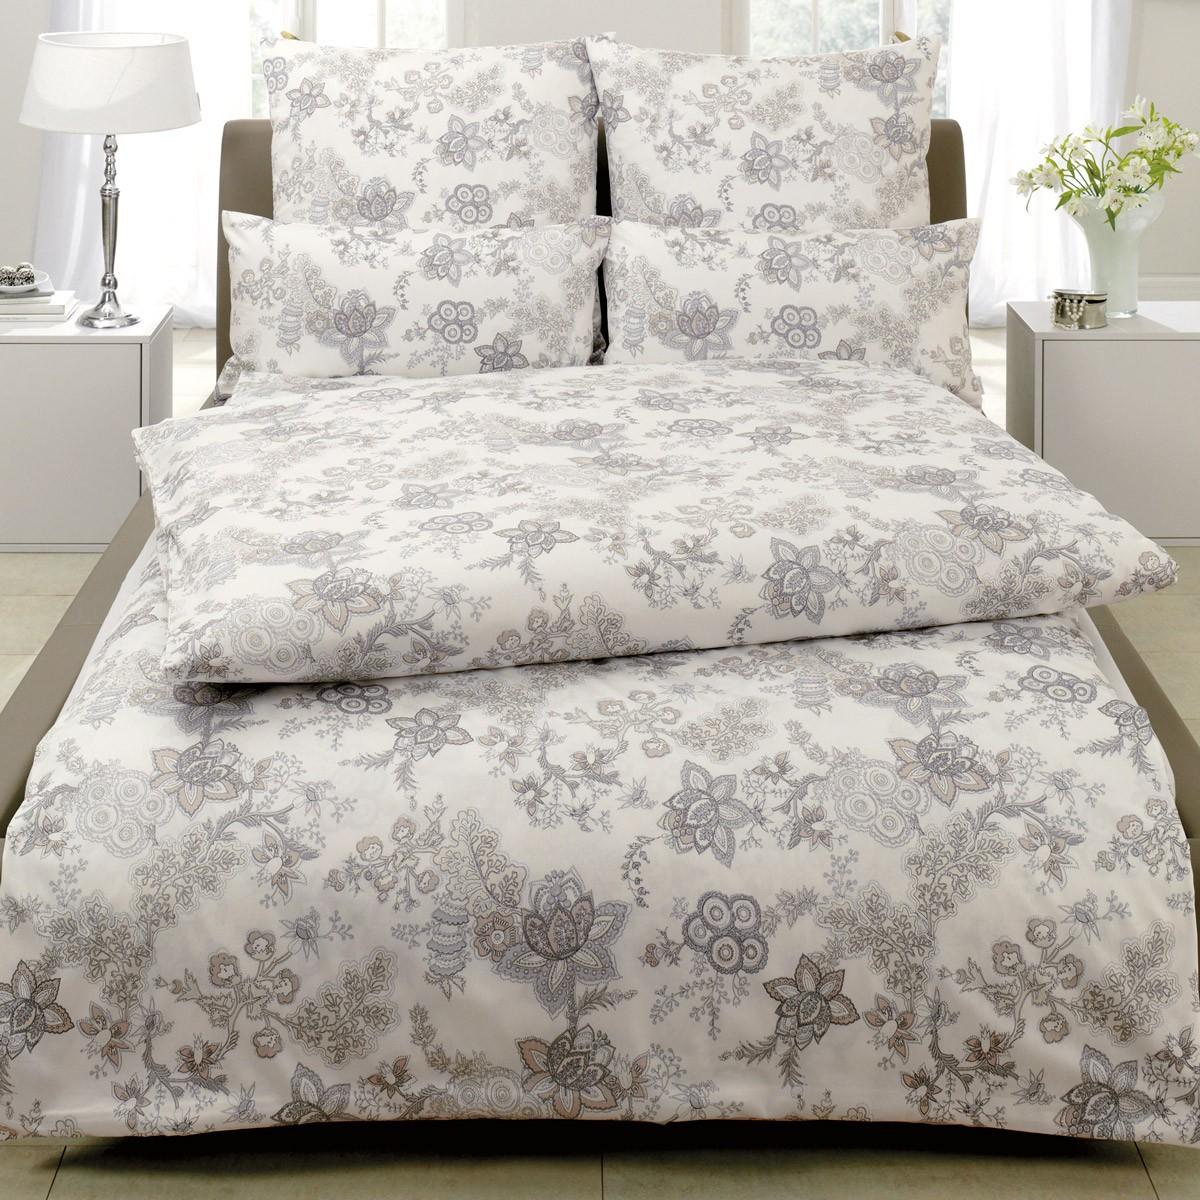 bettw sche estella luc 2404 creme. Black Bedroom Furniture Sets. Home Design Ideas